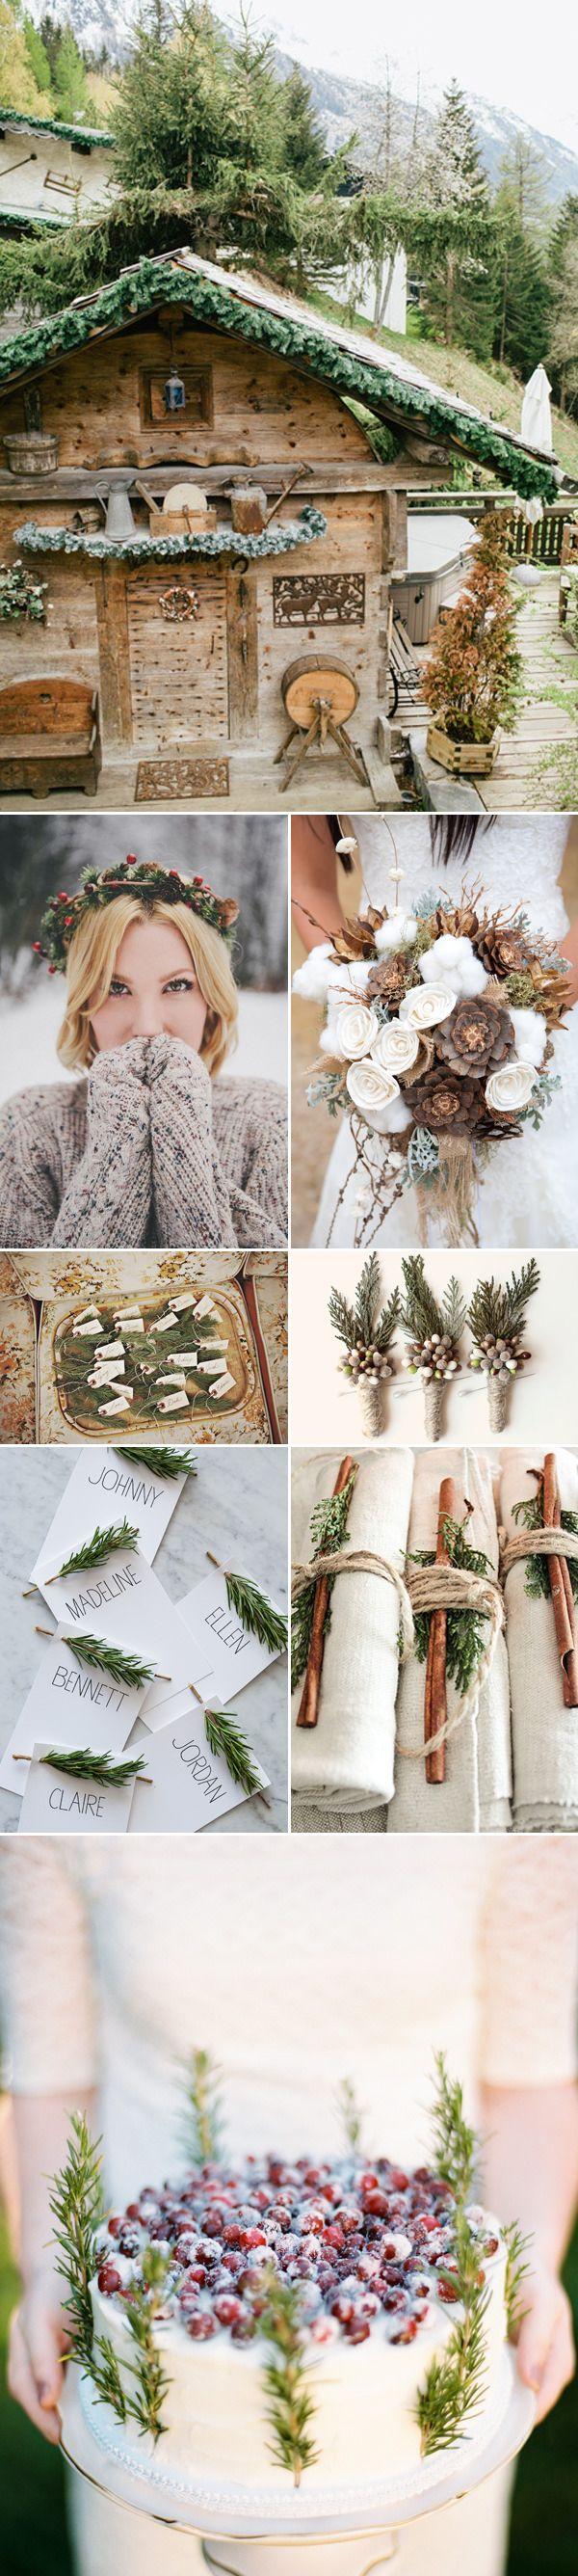 Rustic Mountain Winter Wedding